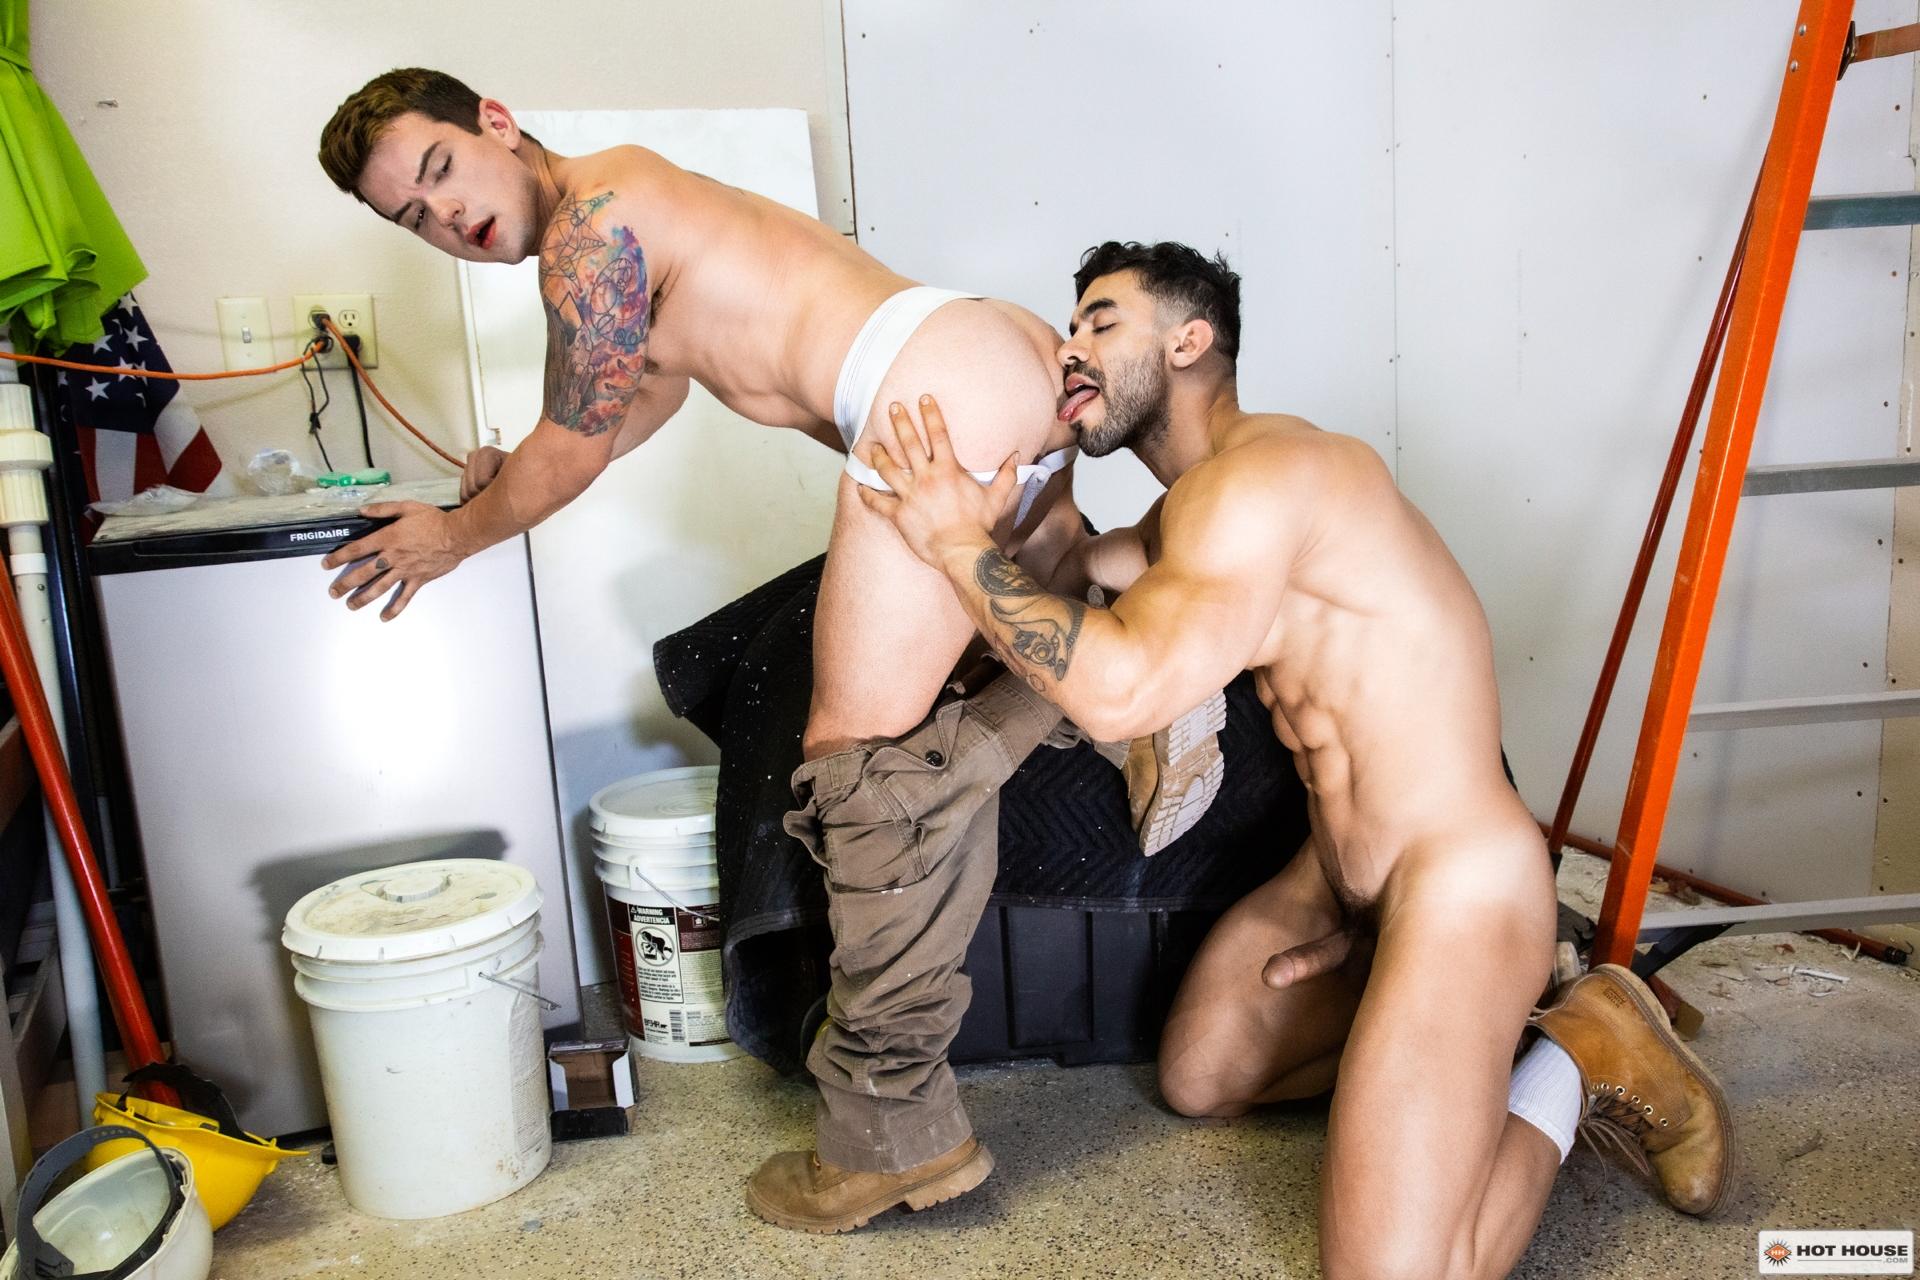 arad winwin fucks dakota payne bareback gay porn